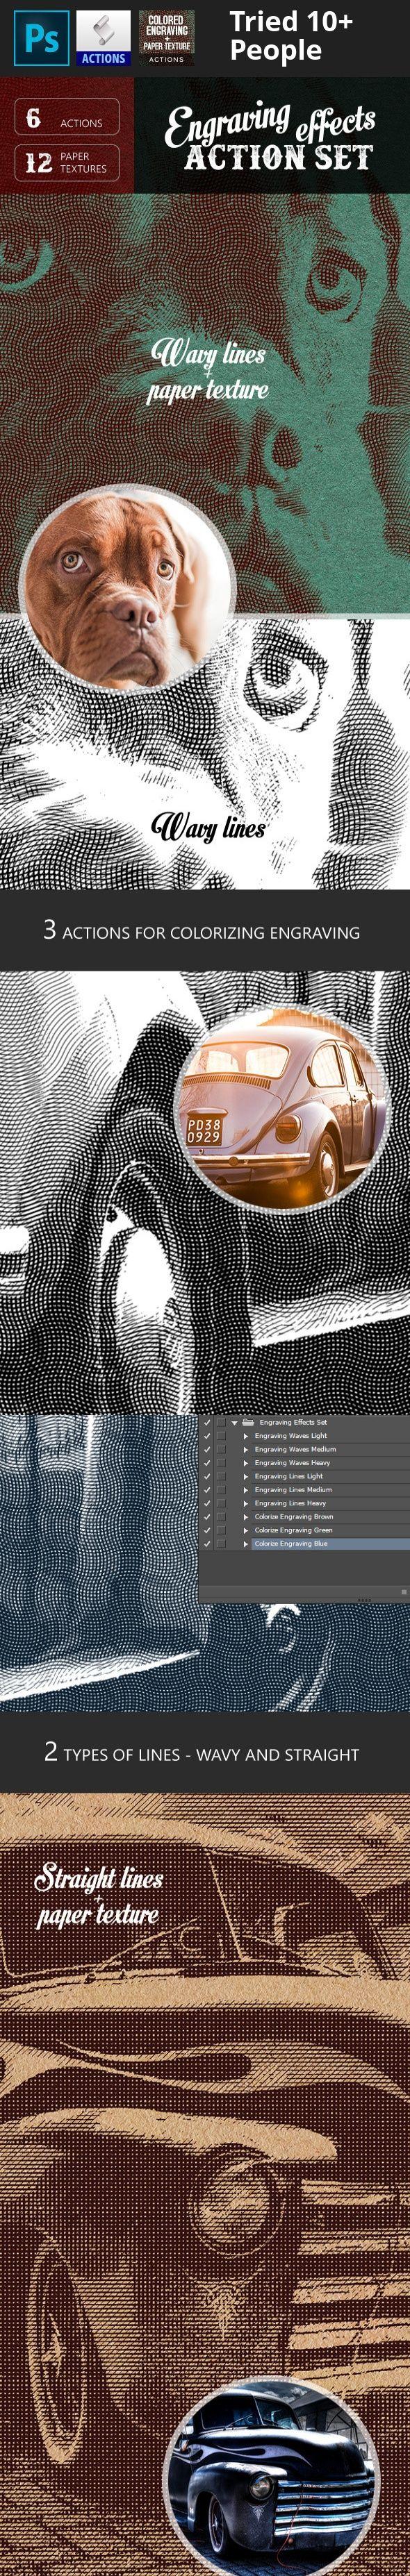 actions, actions pack, adjustment layers, advertising, artistic filter, black and white, blend mode, classic, design, designer, dispersion, effect, engrave, engraving, explode, explosion, graphic, grave, letterpress, line, old, photographer, portrait, retro, vintage Features  1 ATN File 1 PAT File Insruction.txt 3 action for engraving wavy lines (Light, Mediun, Heavy) 3 action for engraving straight lines (Light, Mediun, Heavy) 3 actions for colorizing engraving (Brown, Green, Blue) Easy…